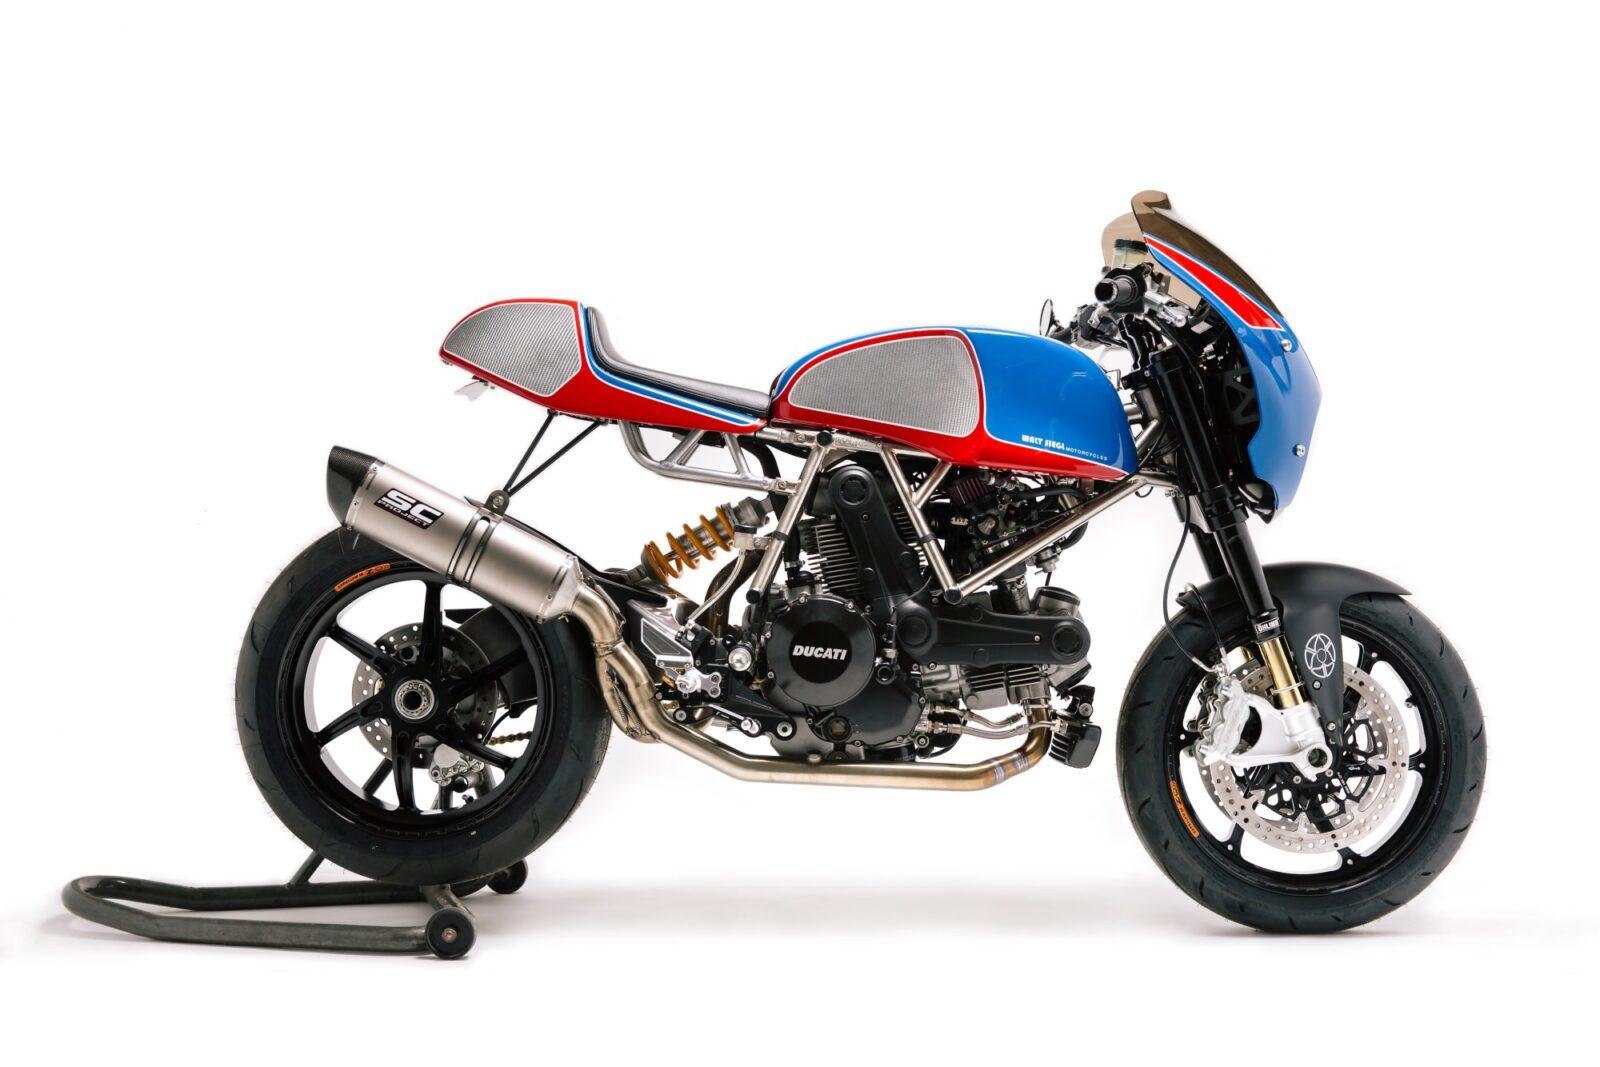 walt siegl ducati leggero45 1600x1067 - The Walt Siegl Leggero GTS